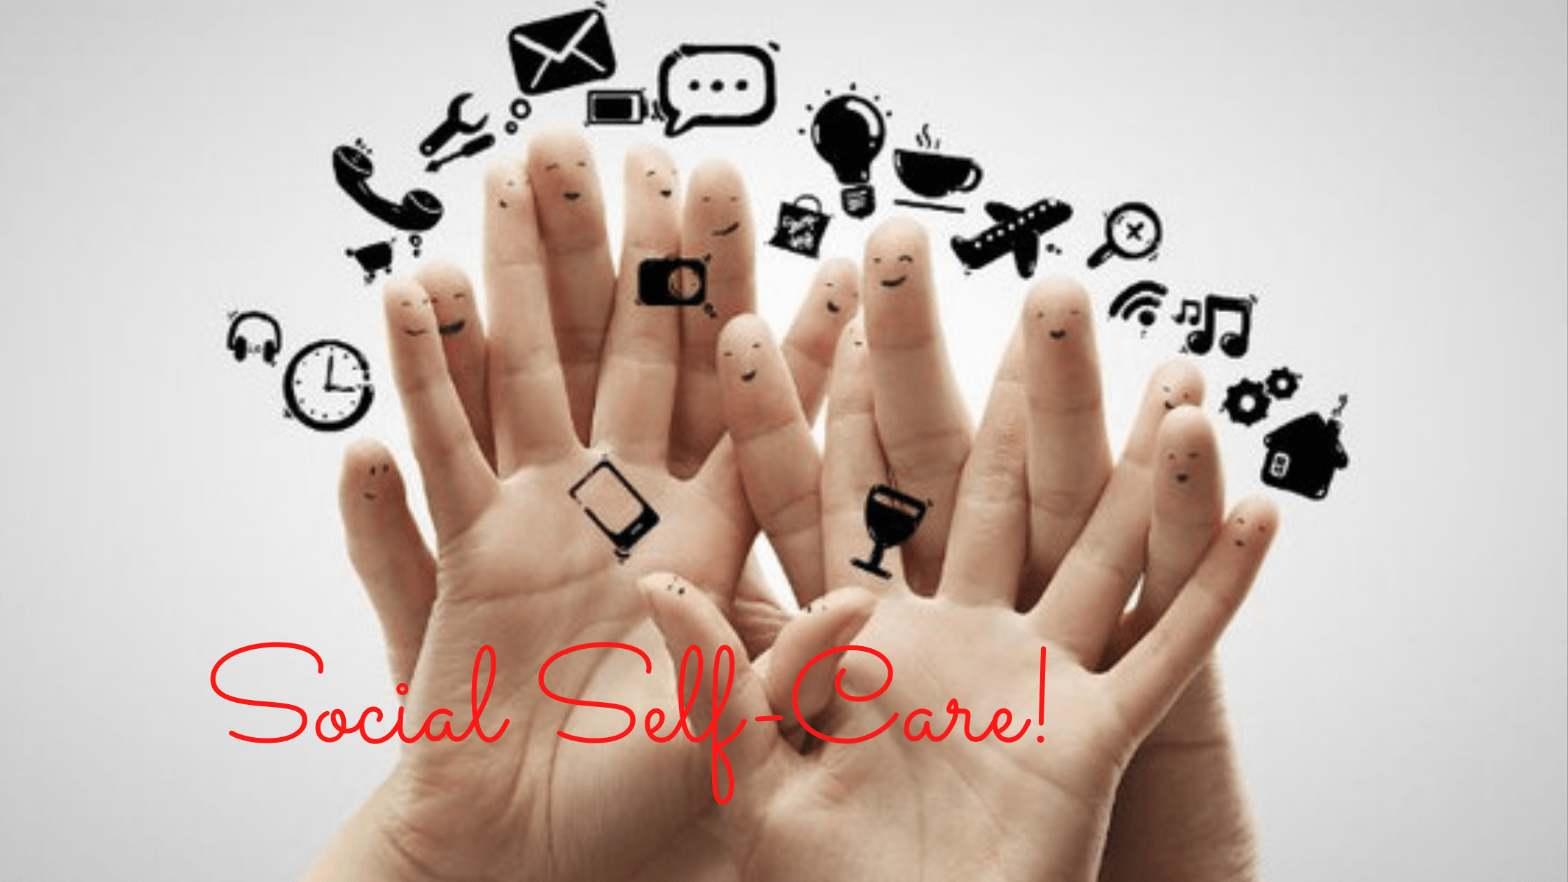 social self care